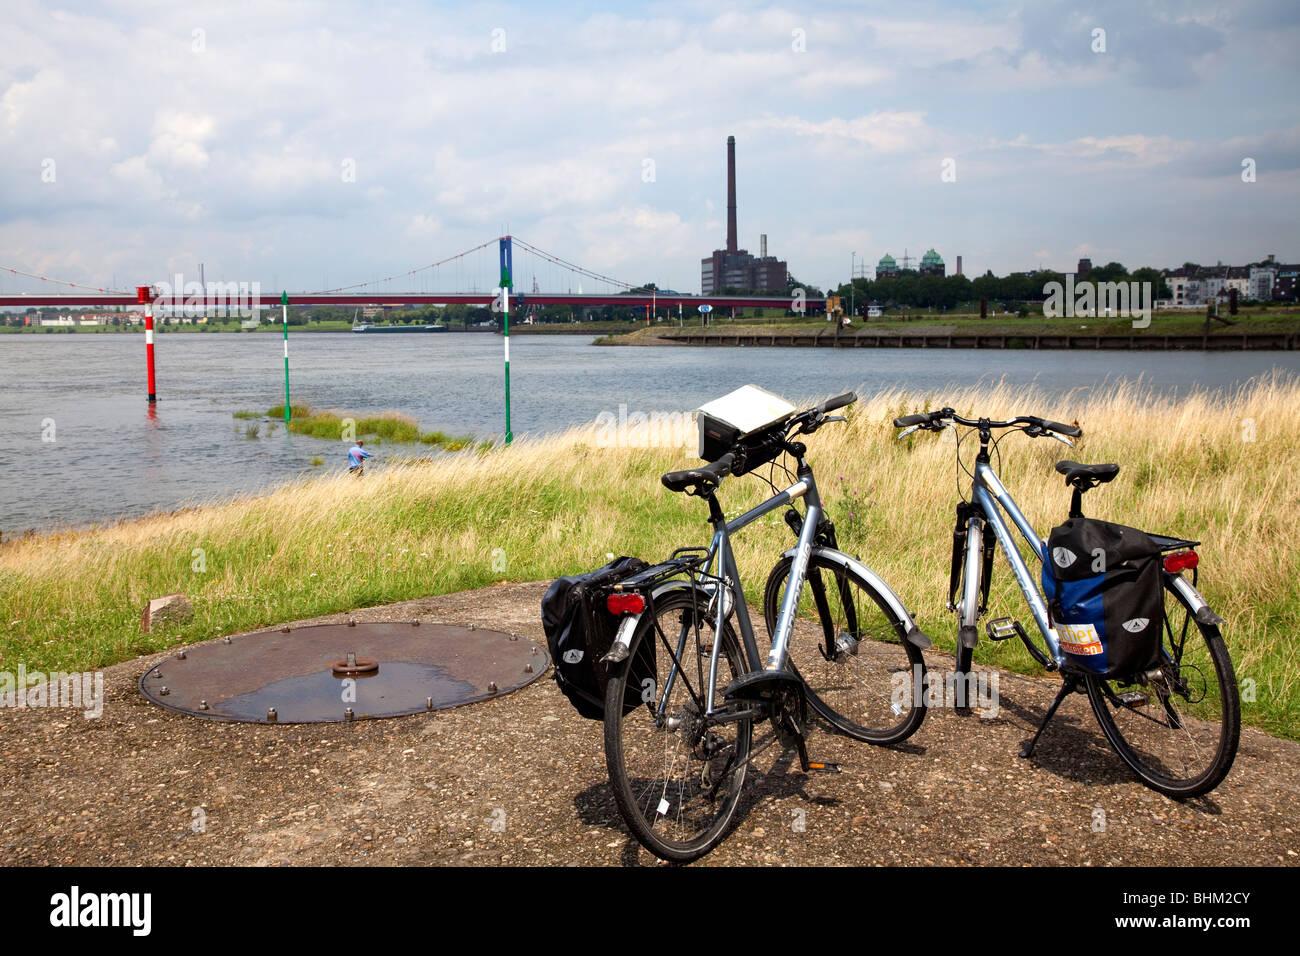 Ruhrtal, Ruhr region in Germany - Stock Image